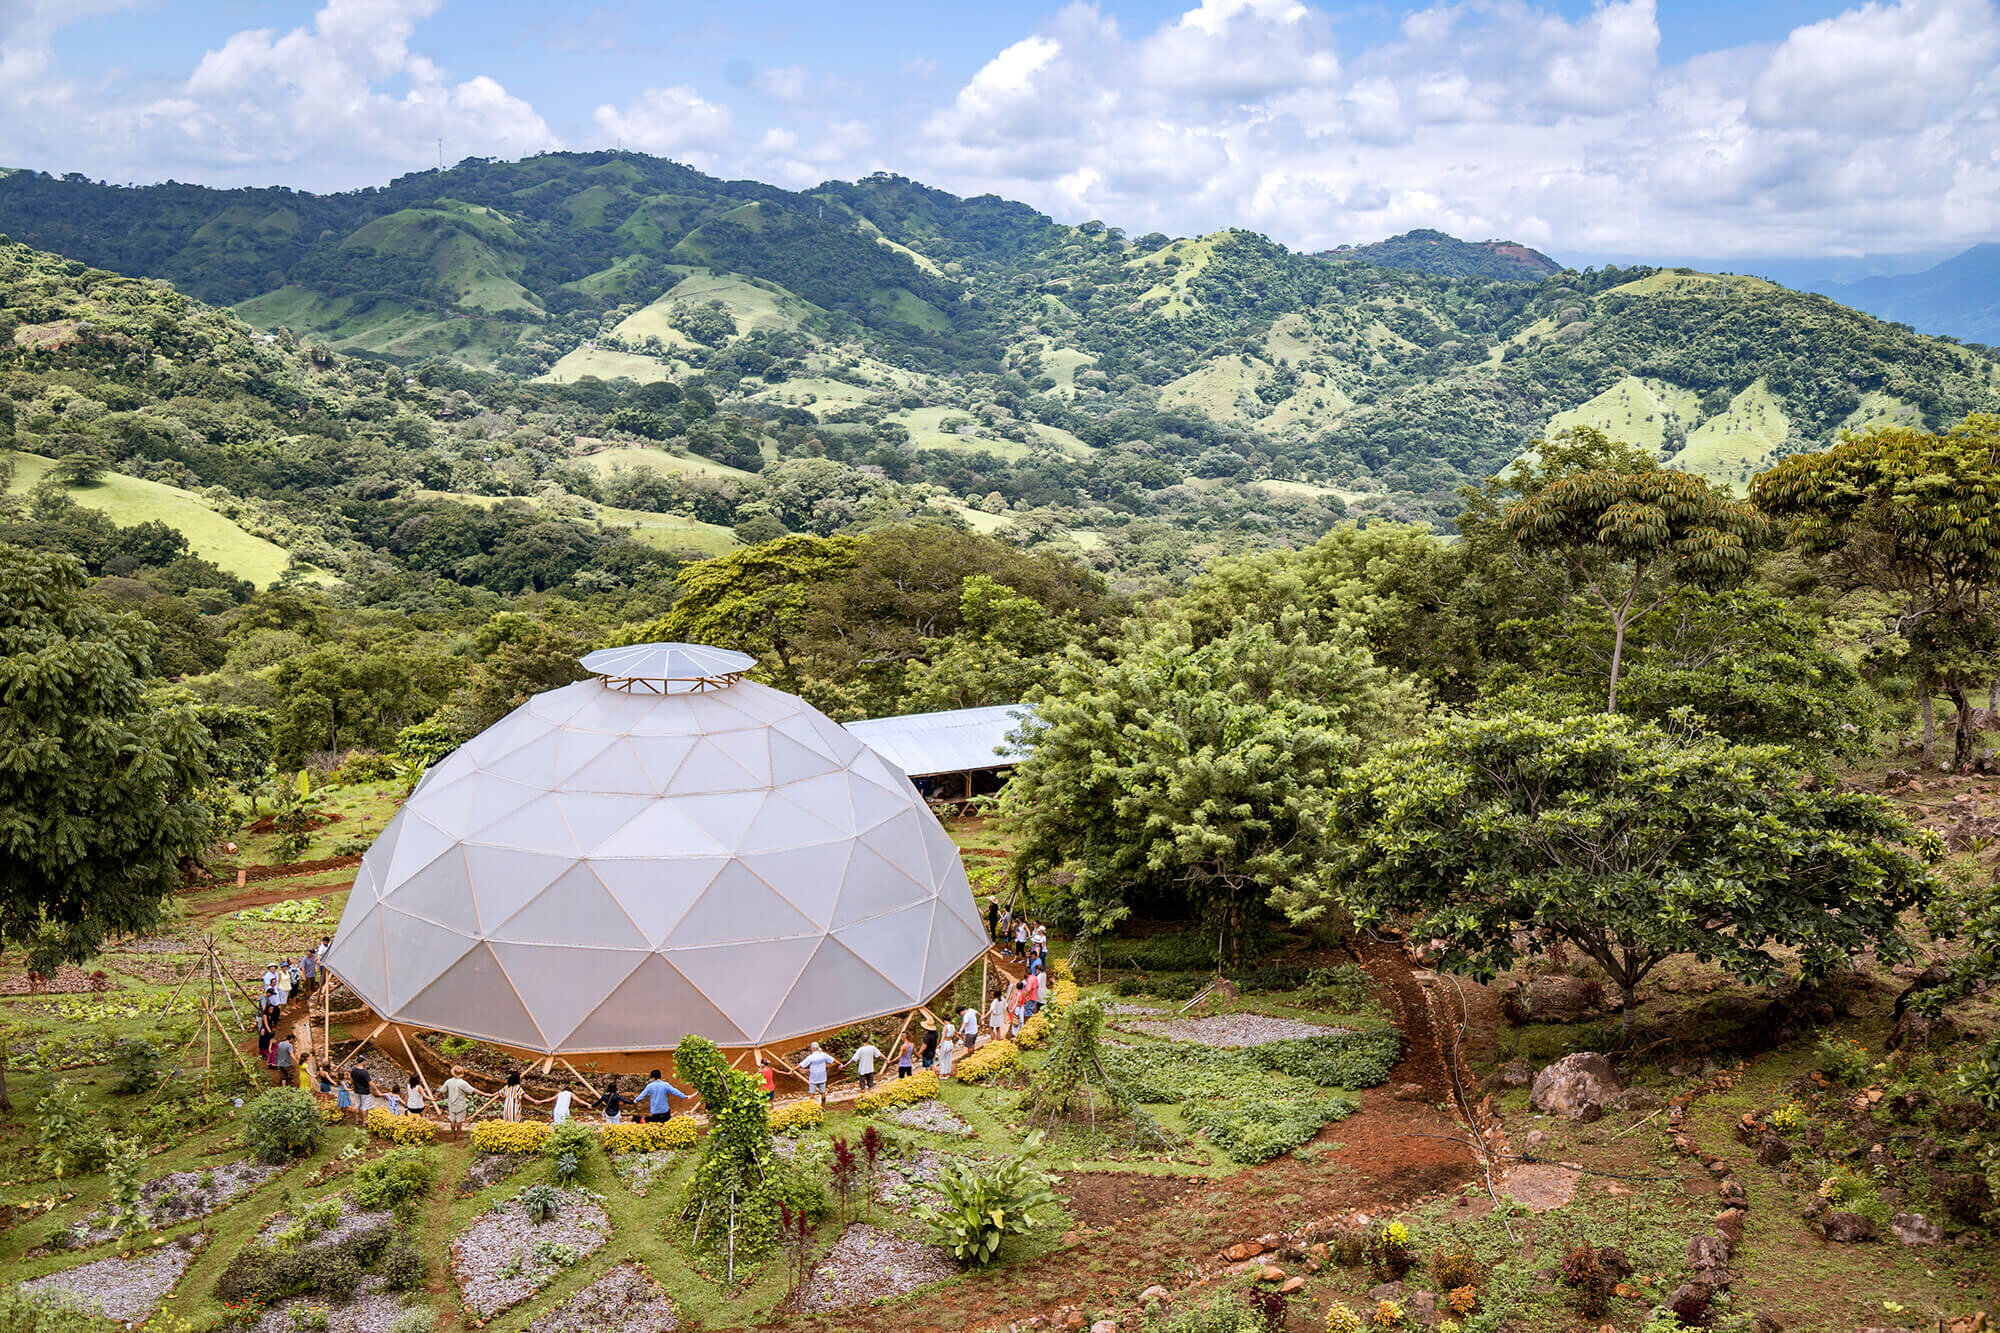 alegria-view-community-dome-circle.jpeg